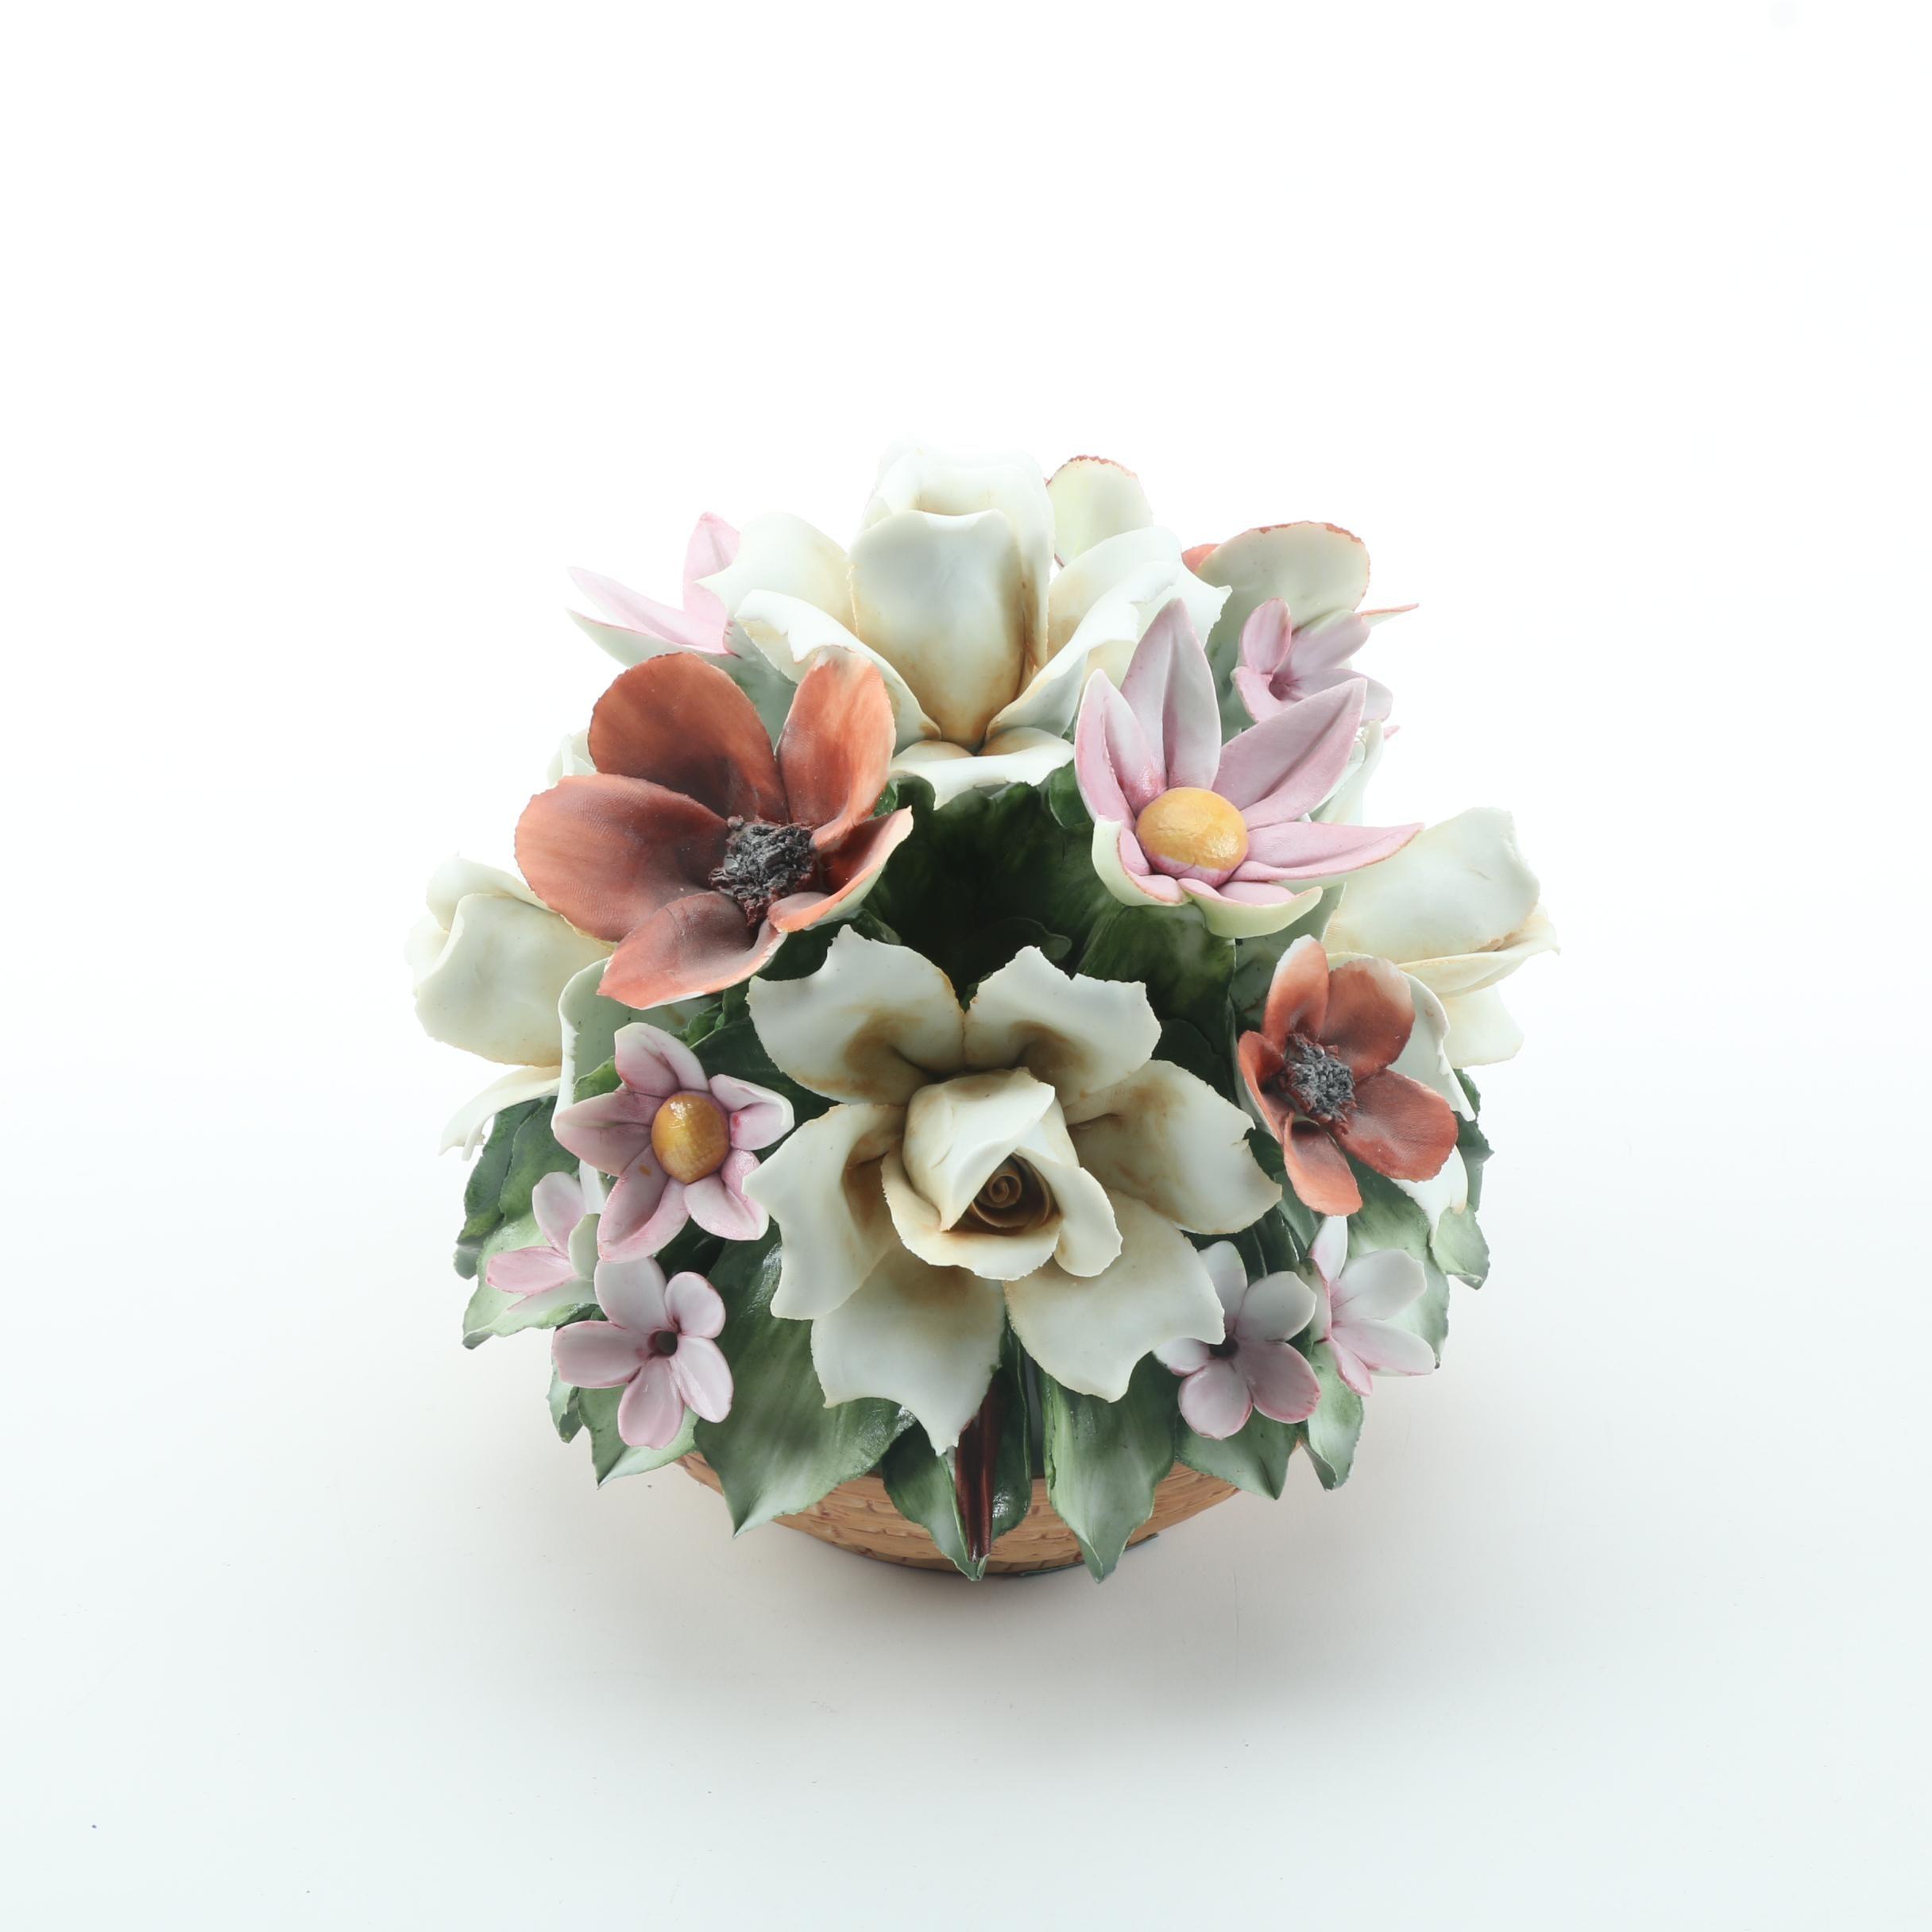 Dino Cucineili Decorative Spring Flowers Arrangement Ebth